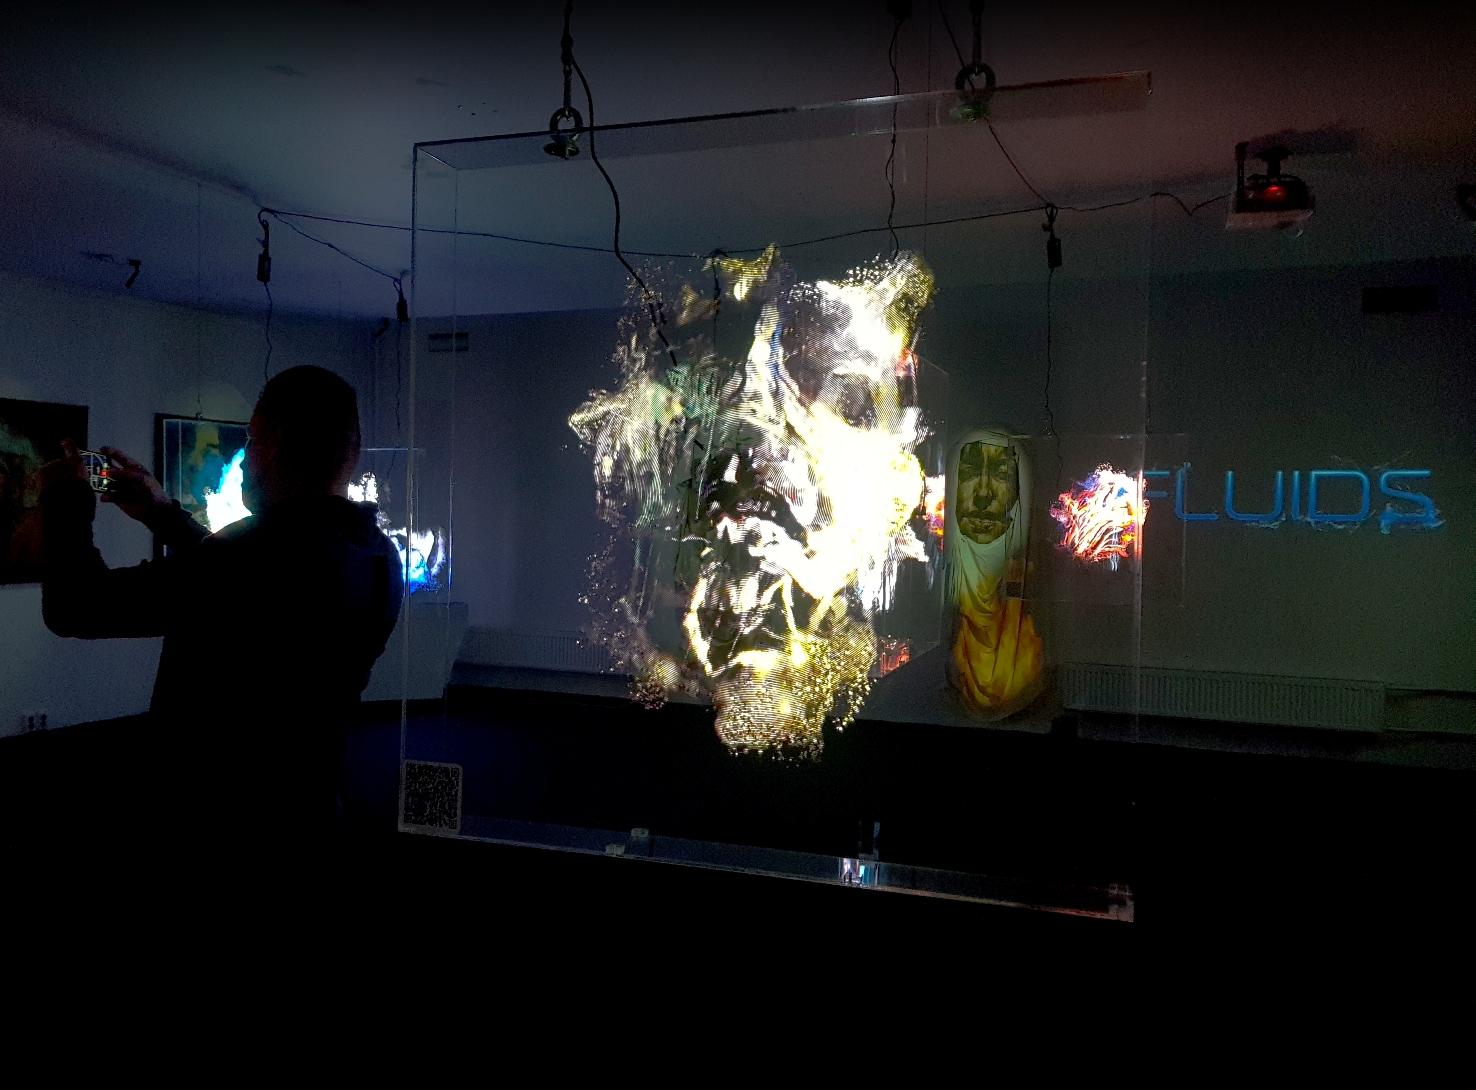 """FLUIDS: A Meta-Connection of Art and Technology"" by Evgeniya Maltseva"